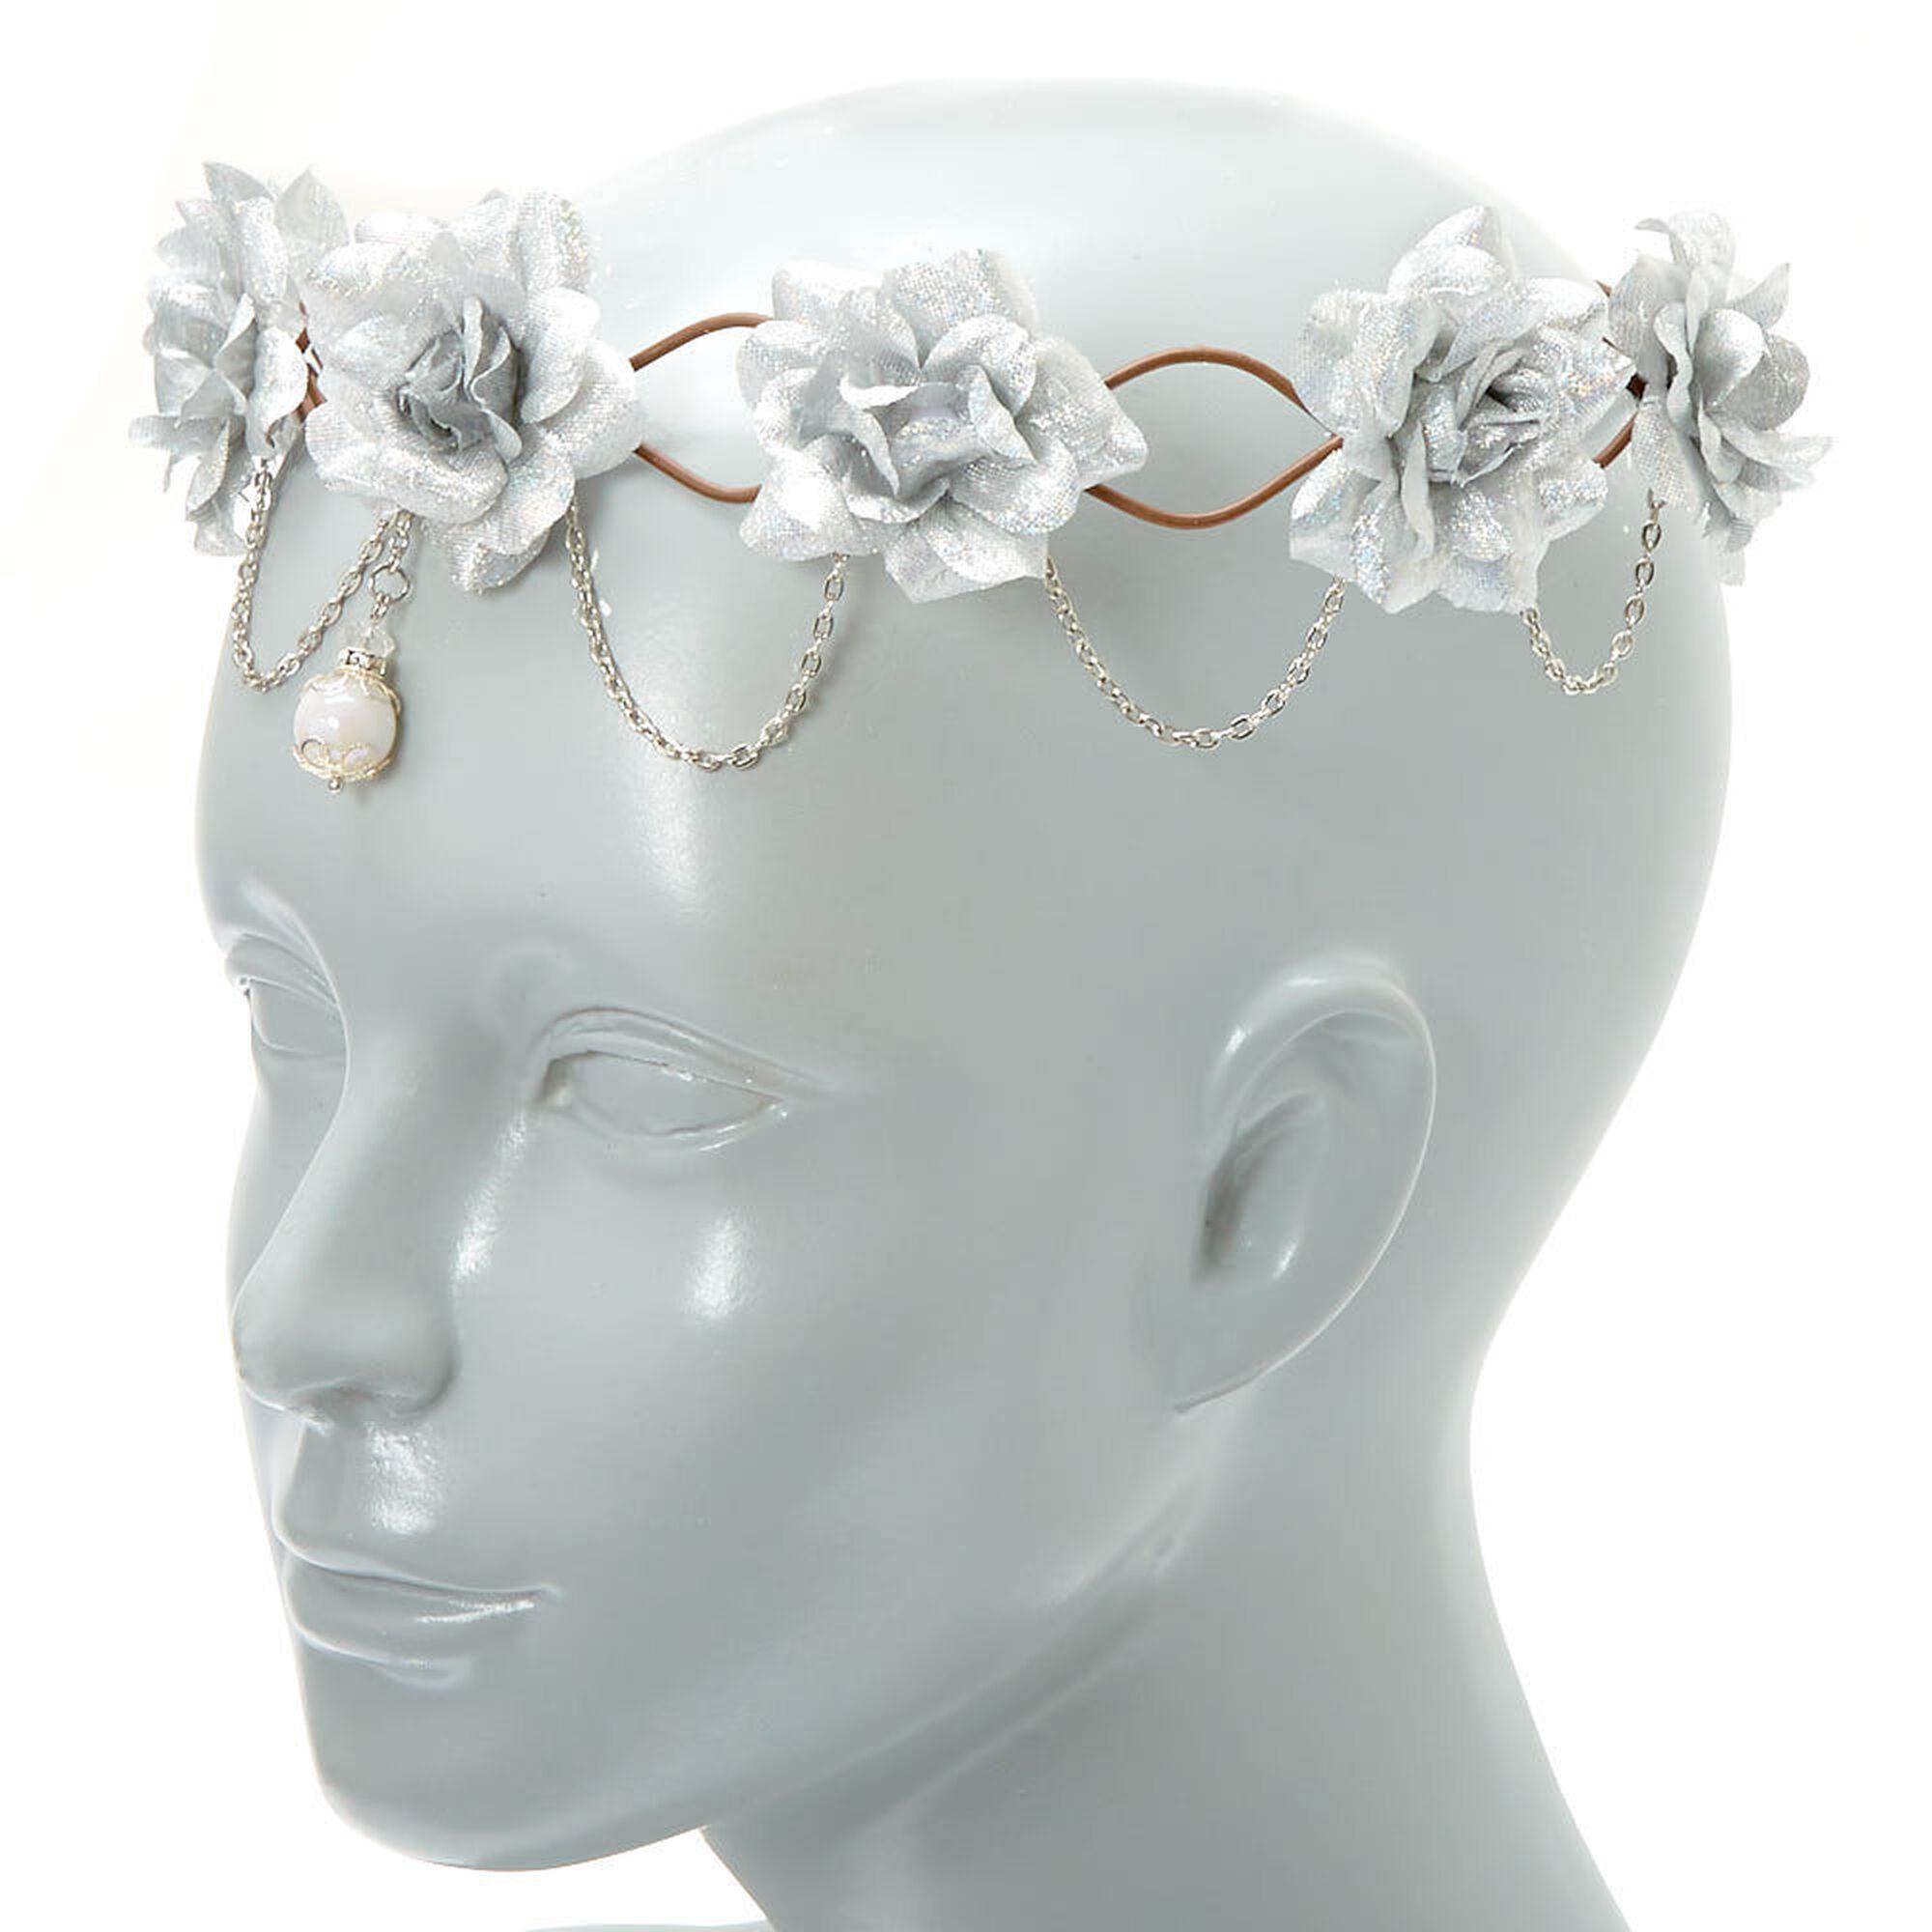 Silver flowers chains flower crown headwrap icing us silver flowers amp chains flower crown headwrap izmirmasajfo